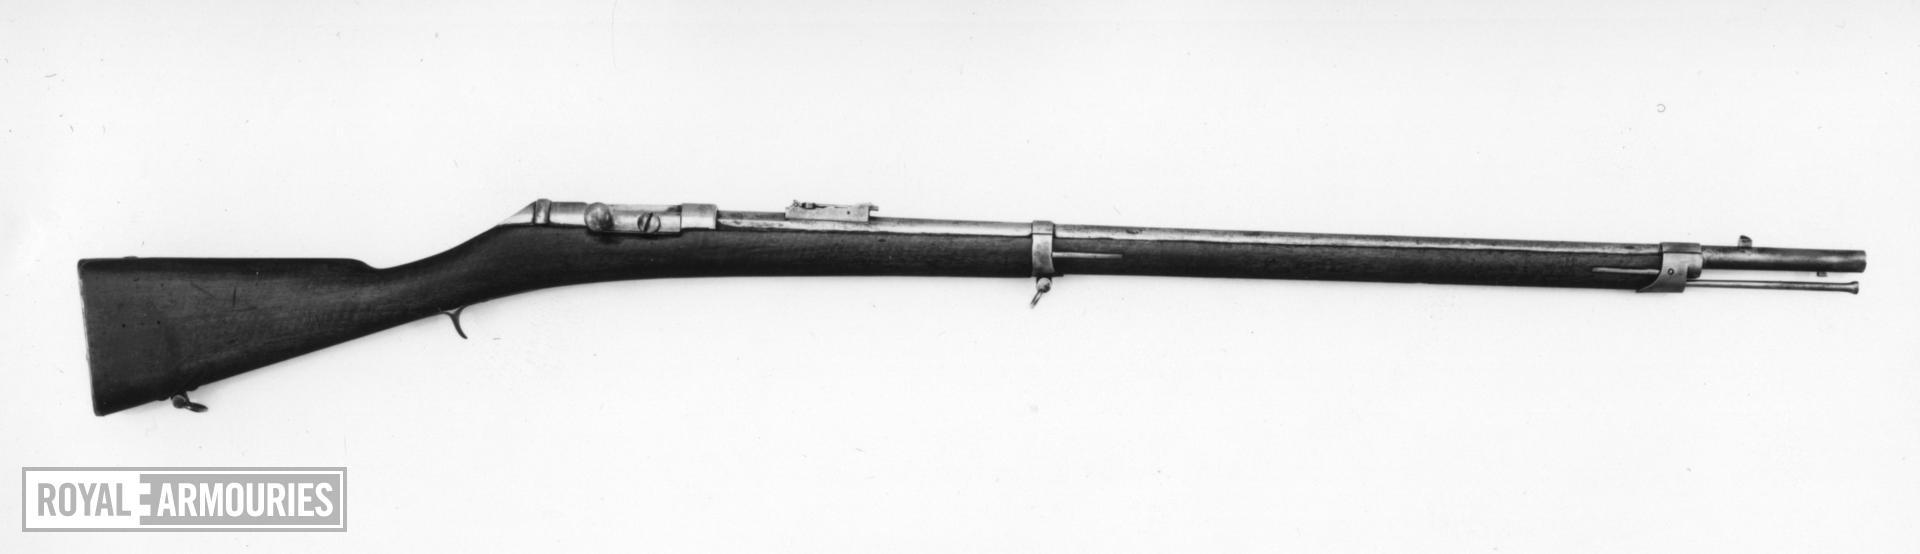 Centrefire breech-loading military rifle - Pieri's System